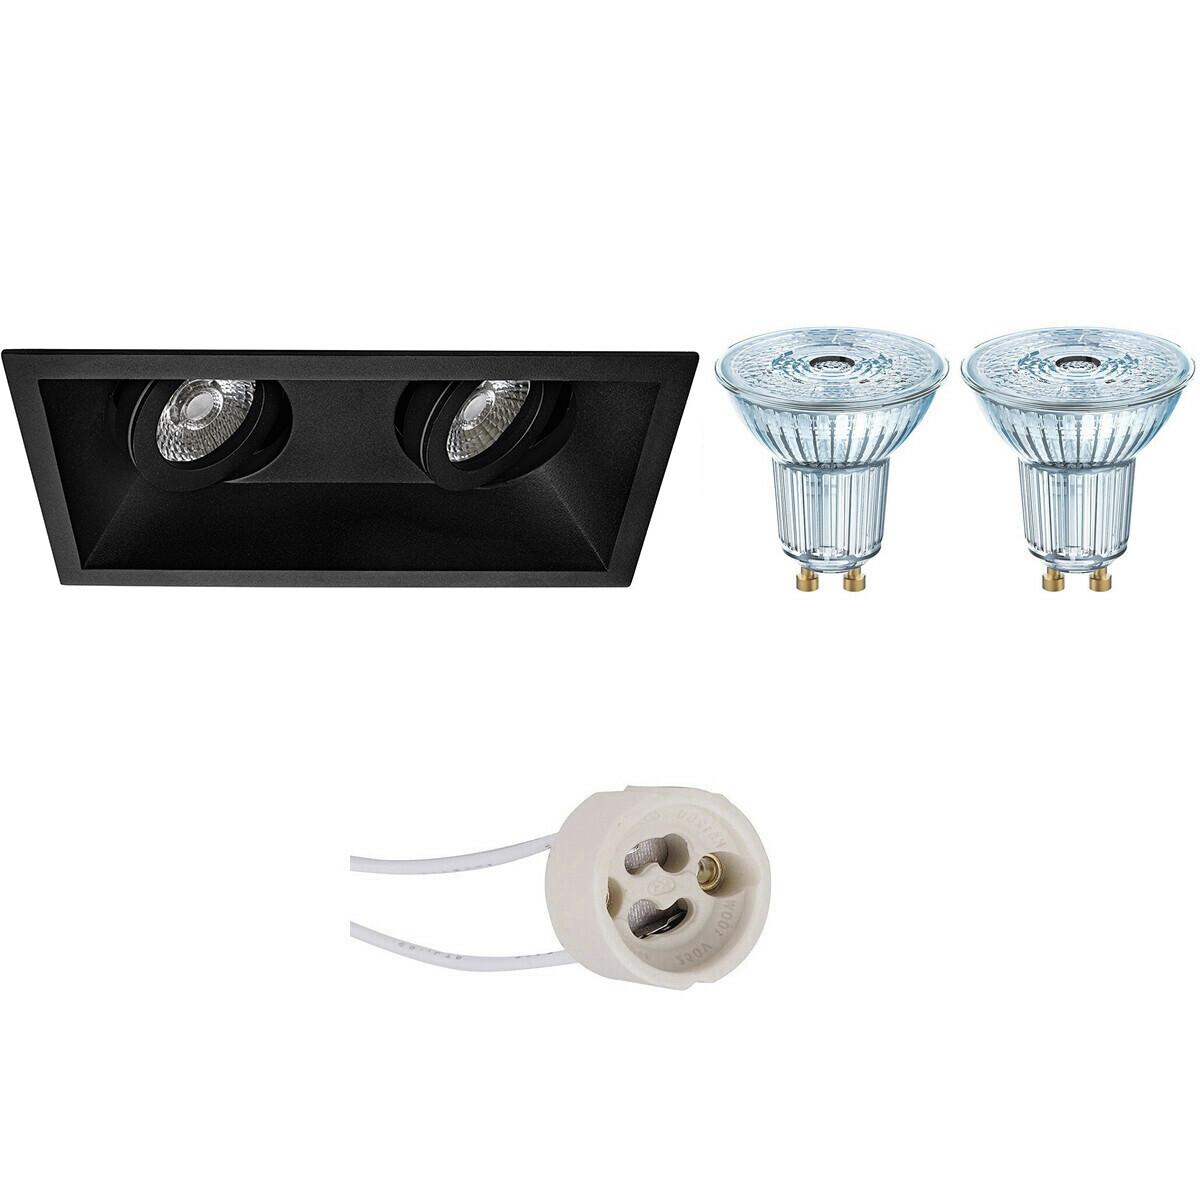 OSRAM - LED Spot Set - Parathom PAR16 940 36D - Pragmi Zano Pro - GU10 Fitting - Dimbaar - Inbouw Re